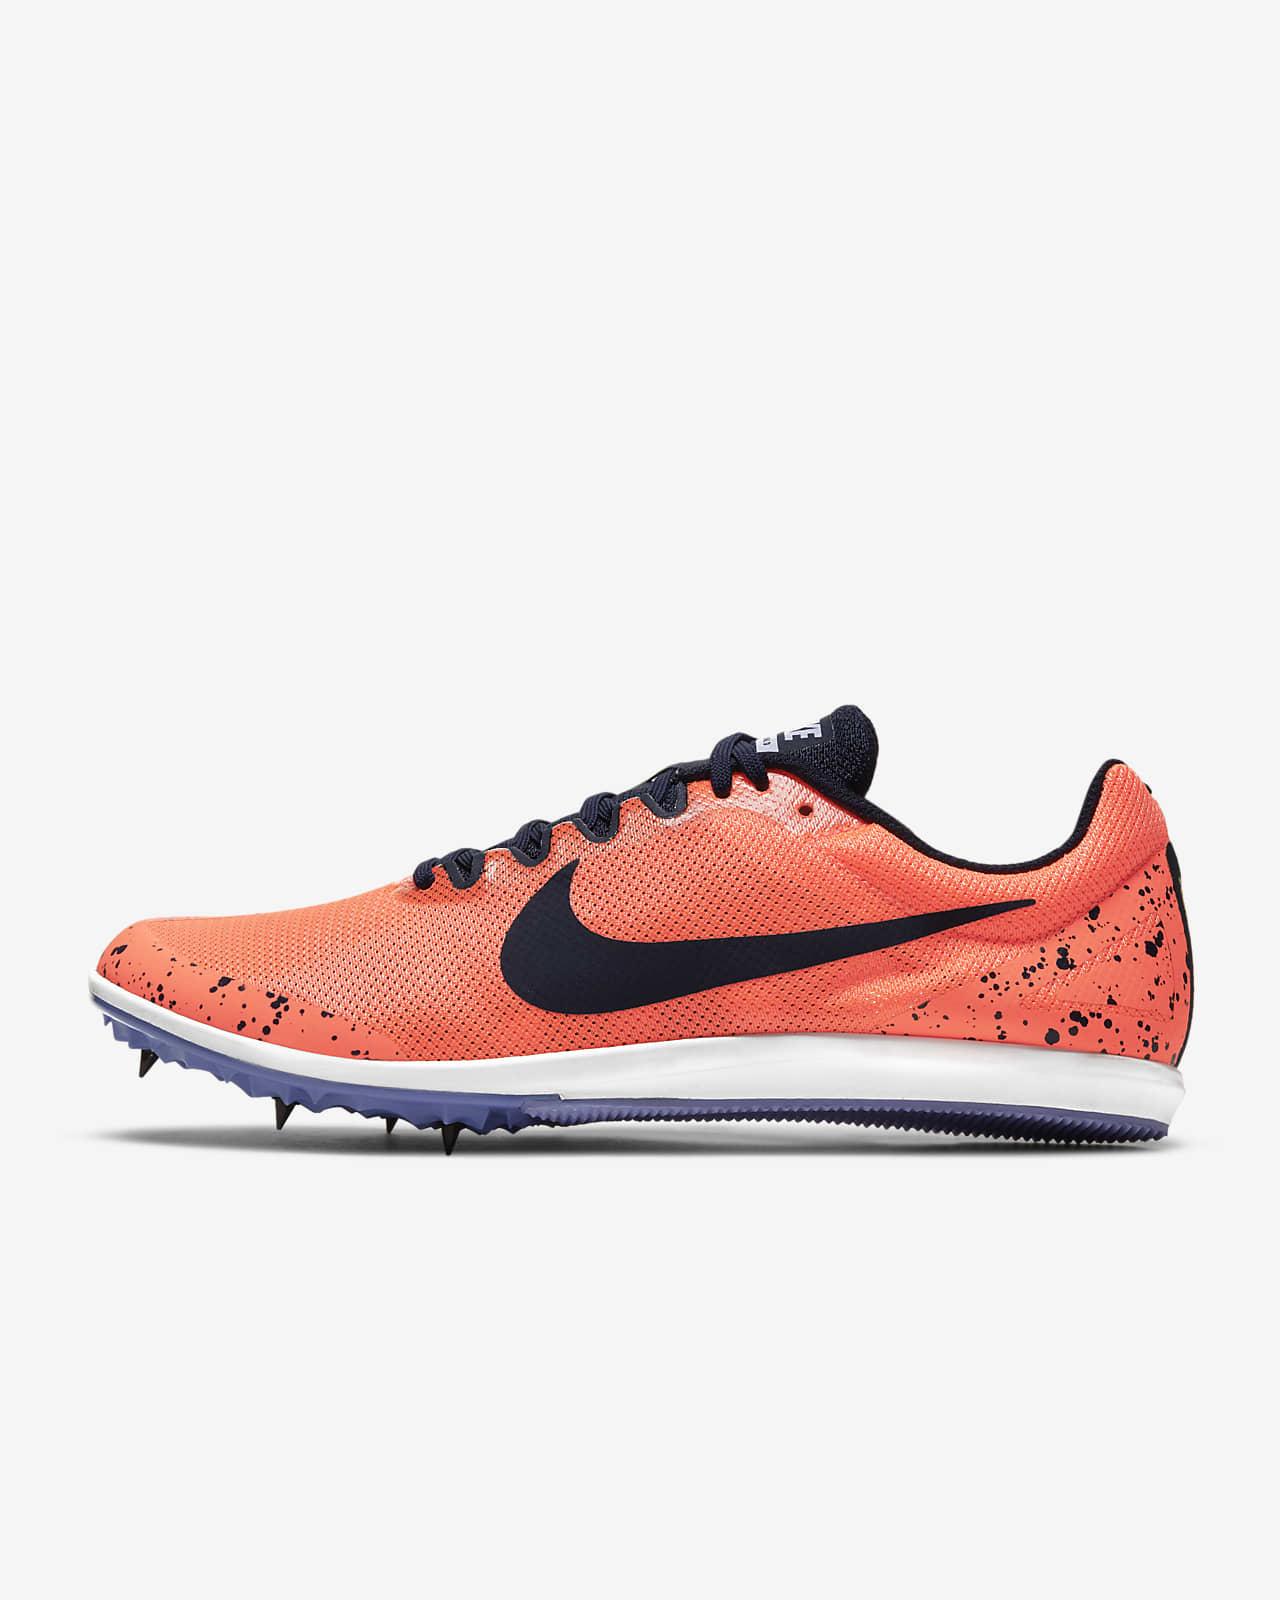 Nike Zoom Rival D 10 Sabatilles amb claus - Unisex